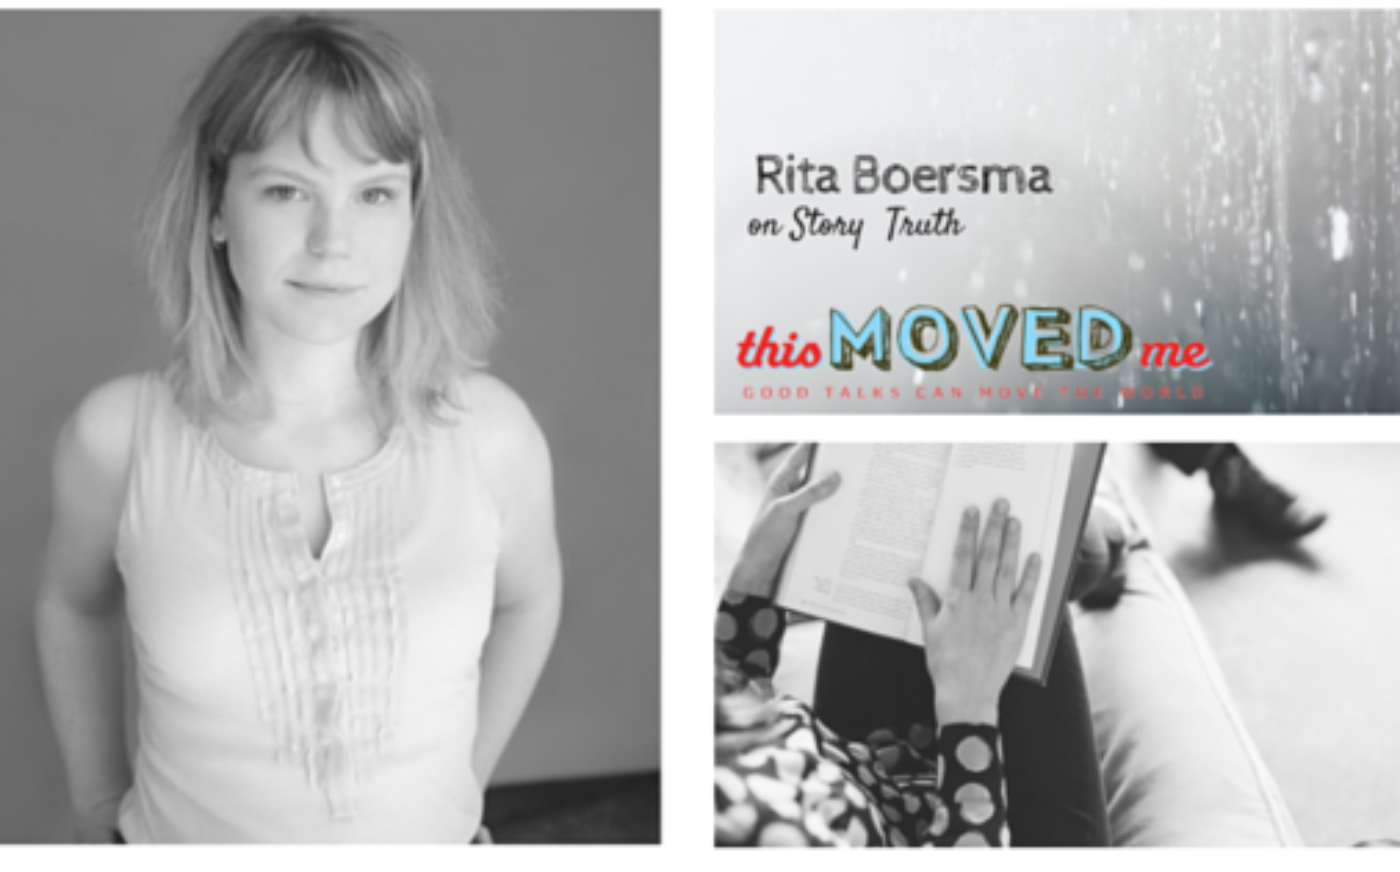 TMM-Rita-Boersma-Blog-Graphic-1400x872.png